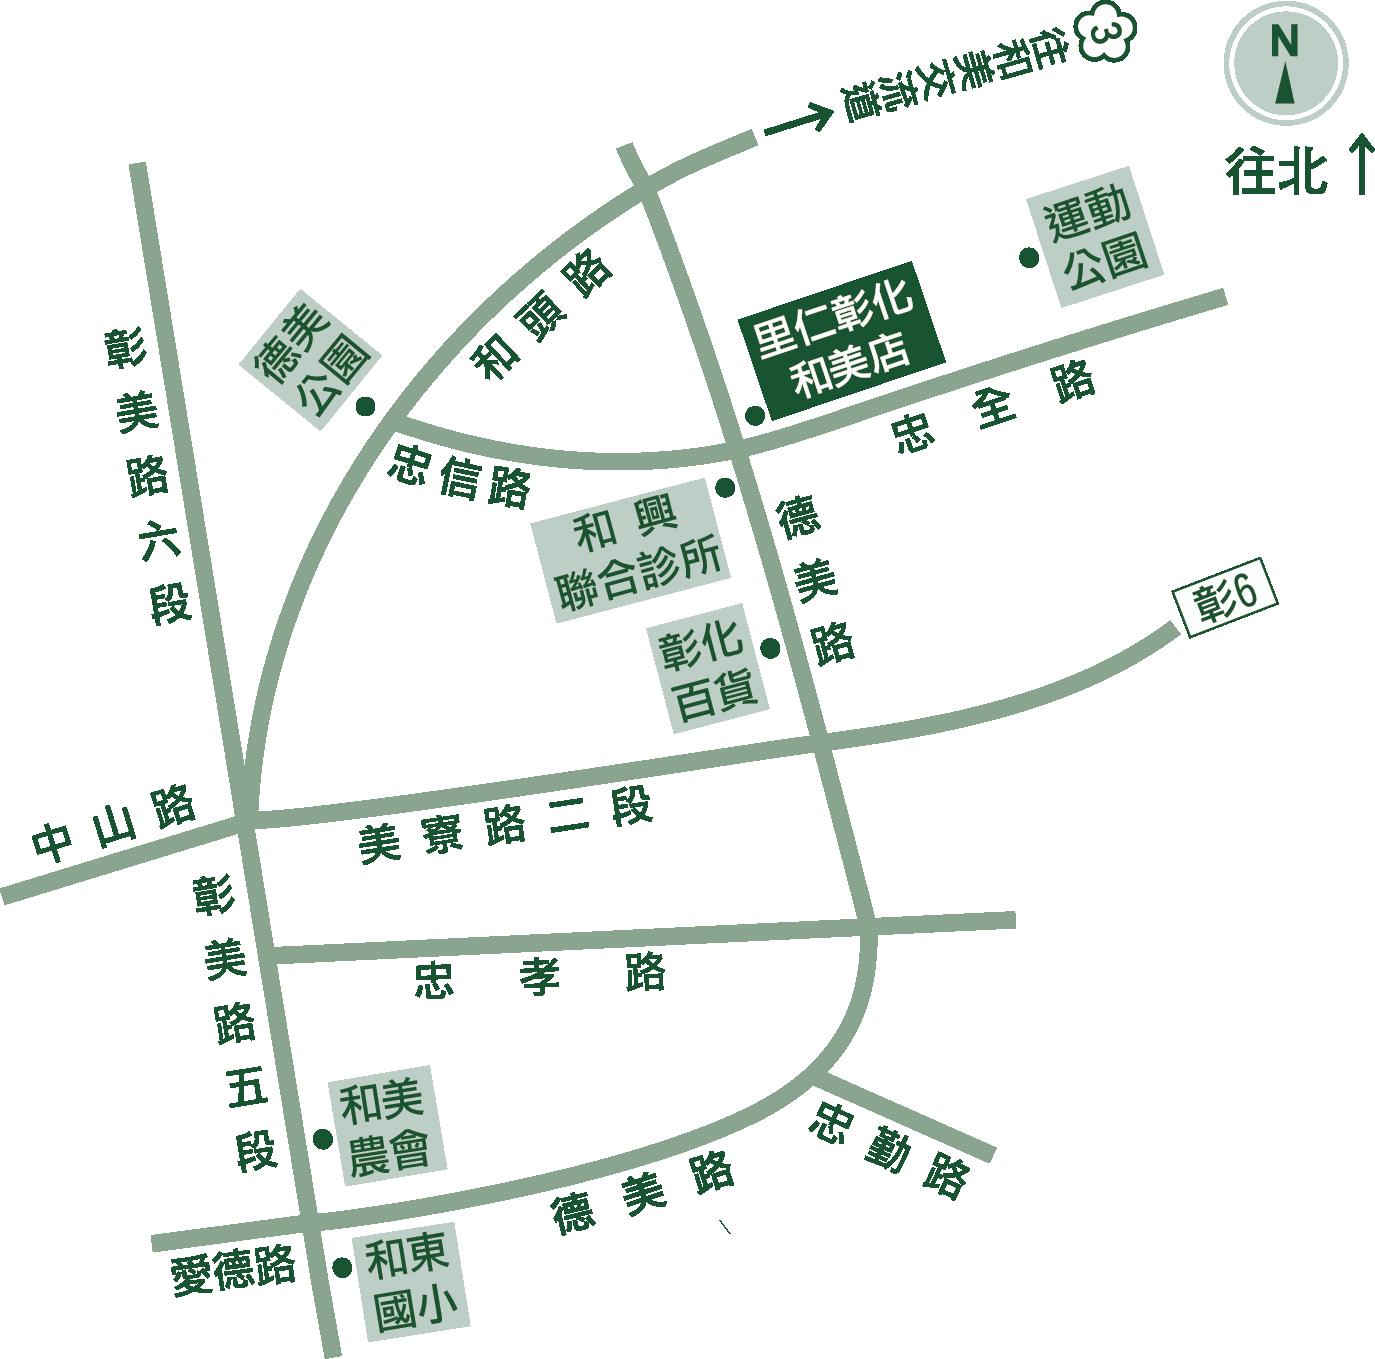 里仁彰化和美店地圖Leezen map